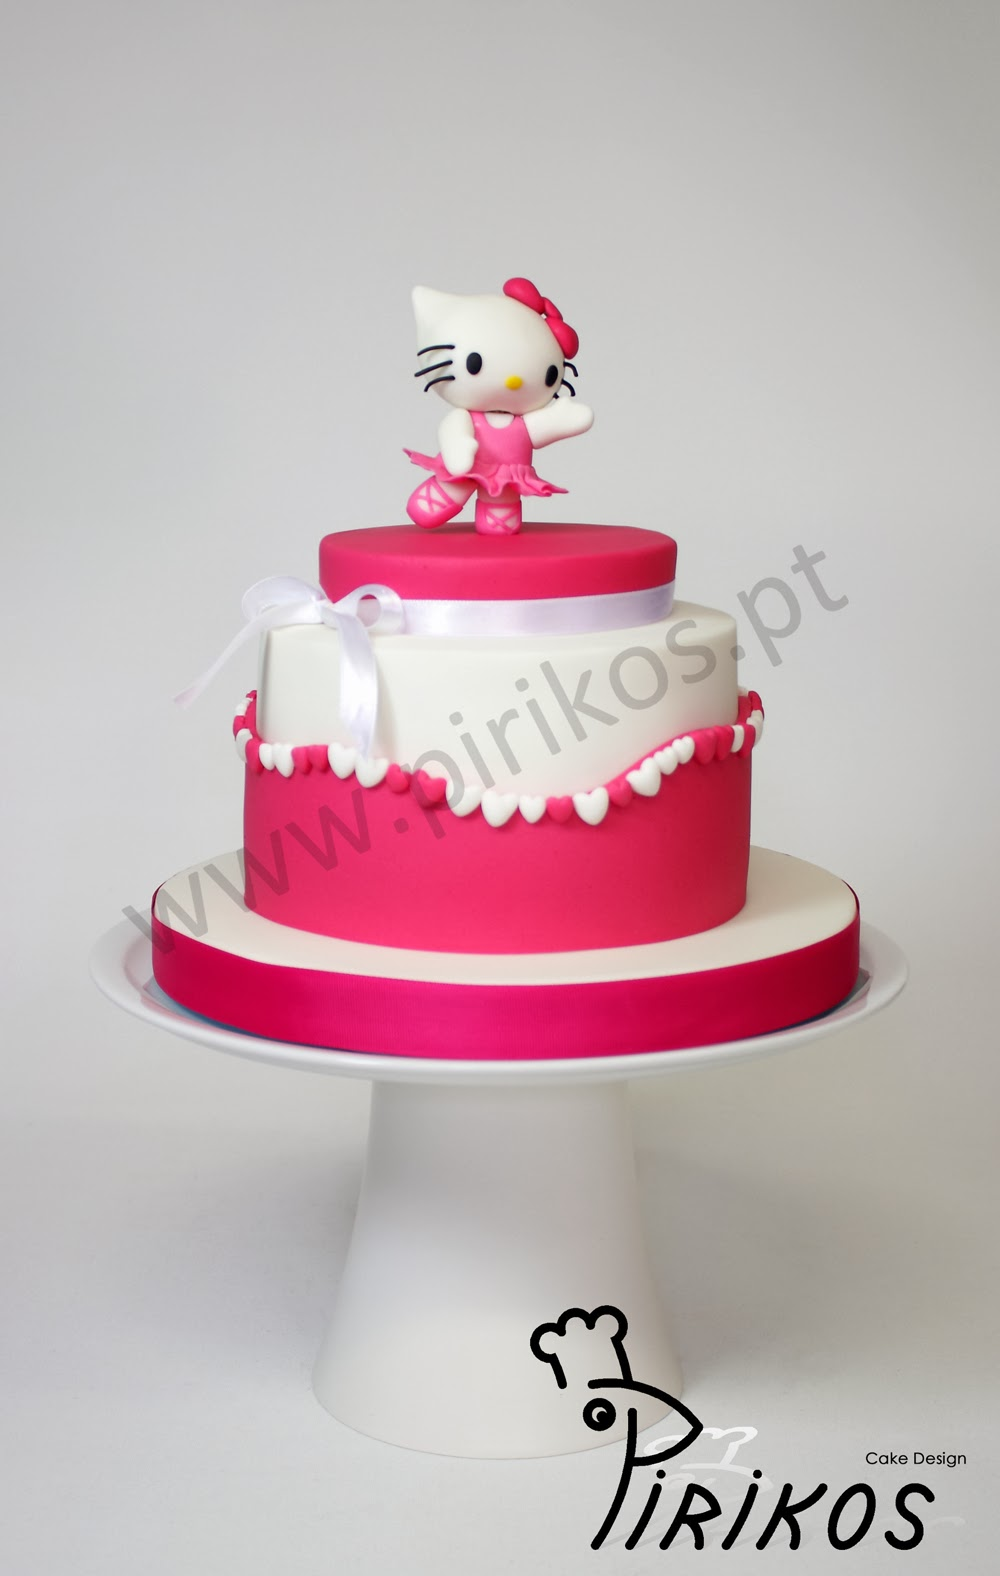 Cake Design Ulm : Pirikos Cake Design: Bolo Hello Kitty Bailarina